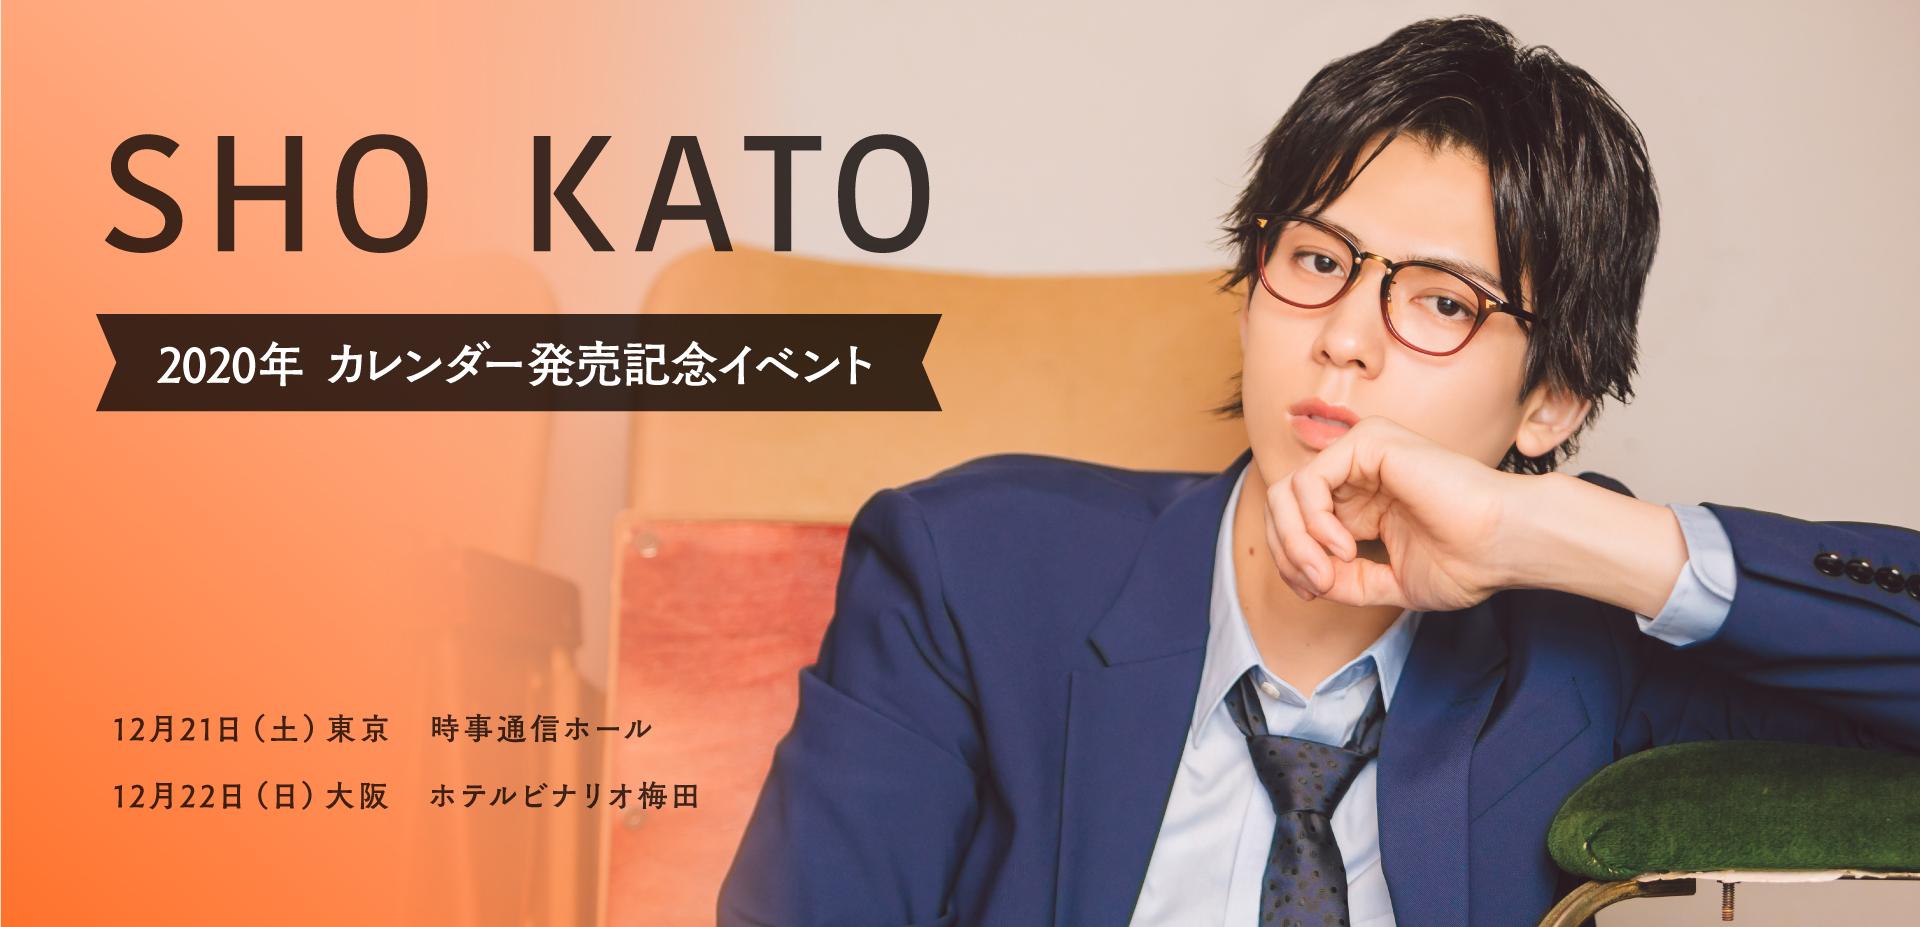 Kato_2020cl_mainimg